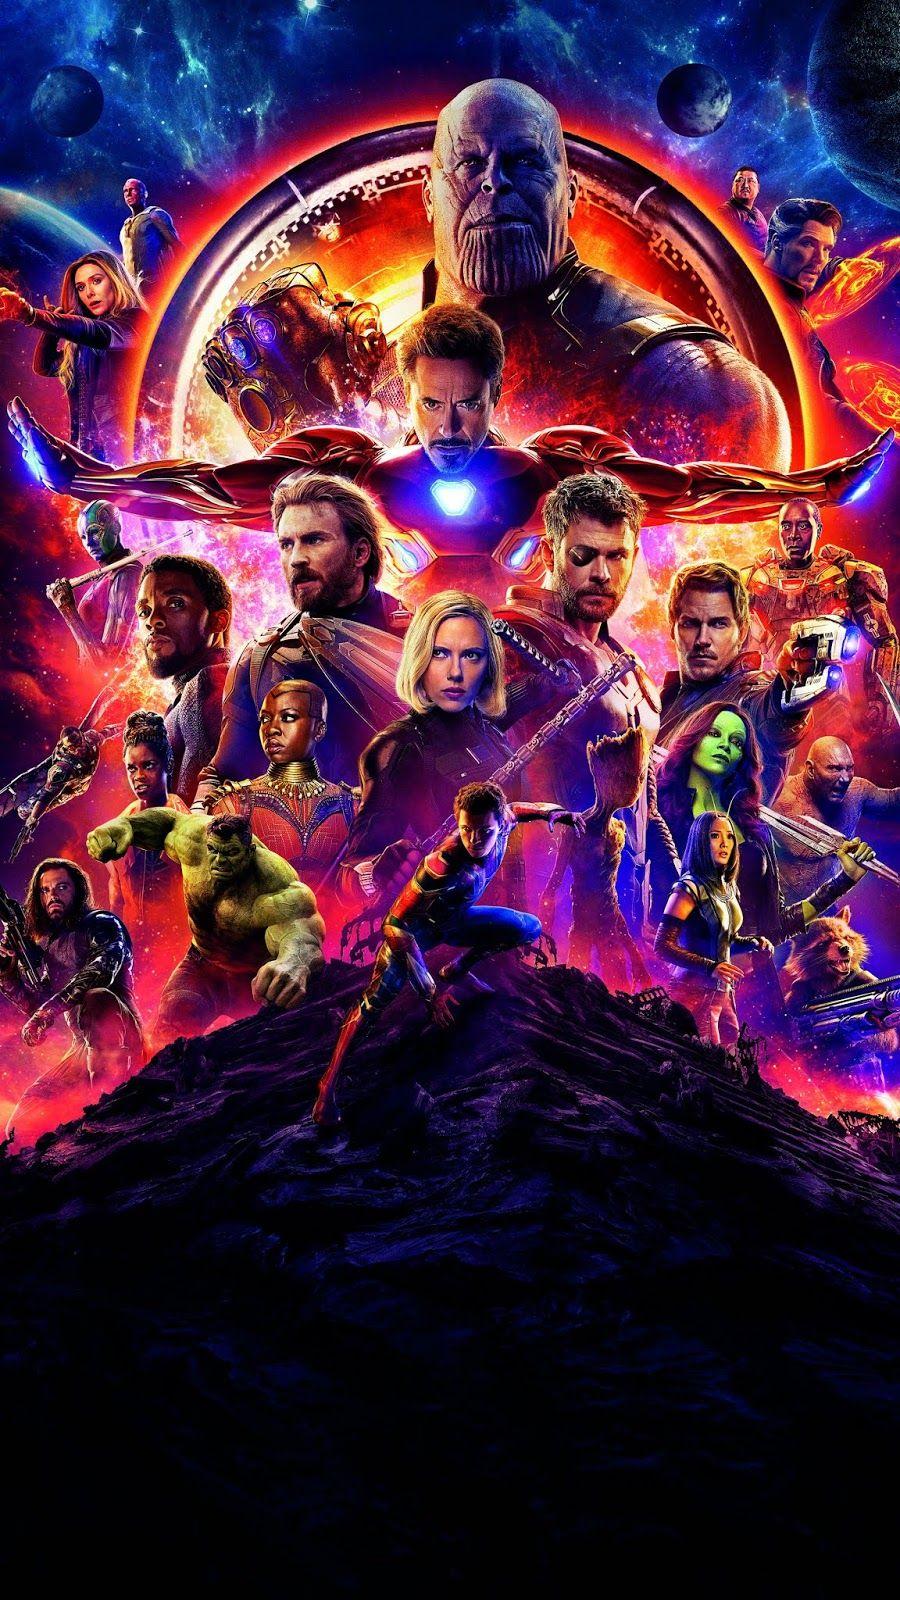 Avengers Infinity War Textless Hd Wallpaper Avengers Poster Marvel Background Avengers Pictures